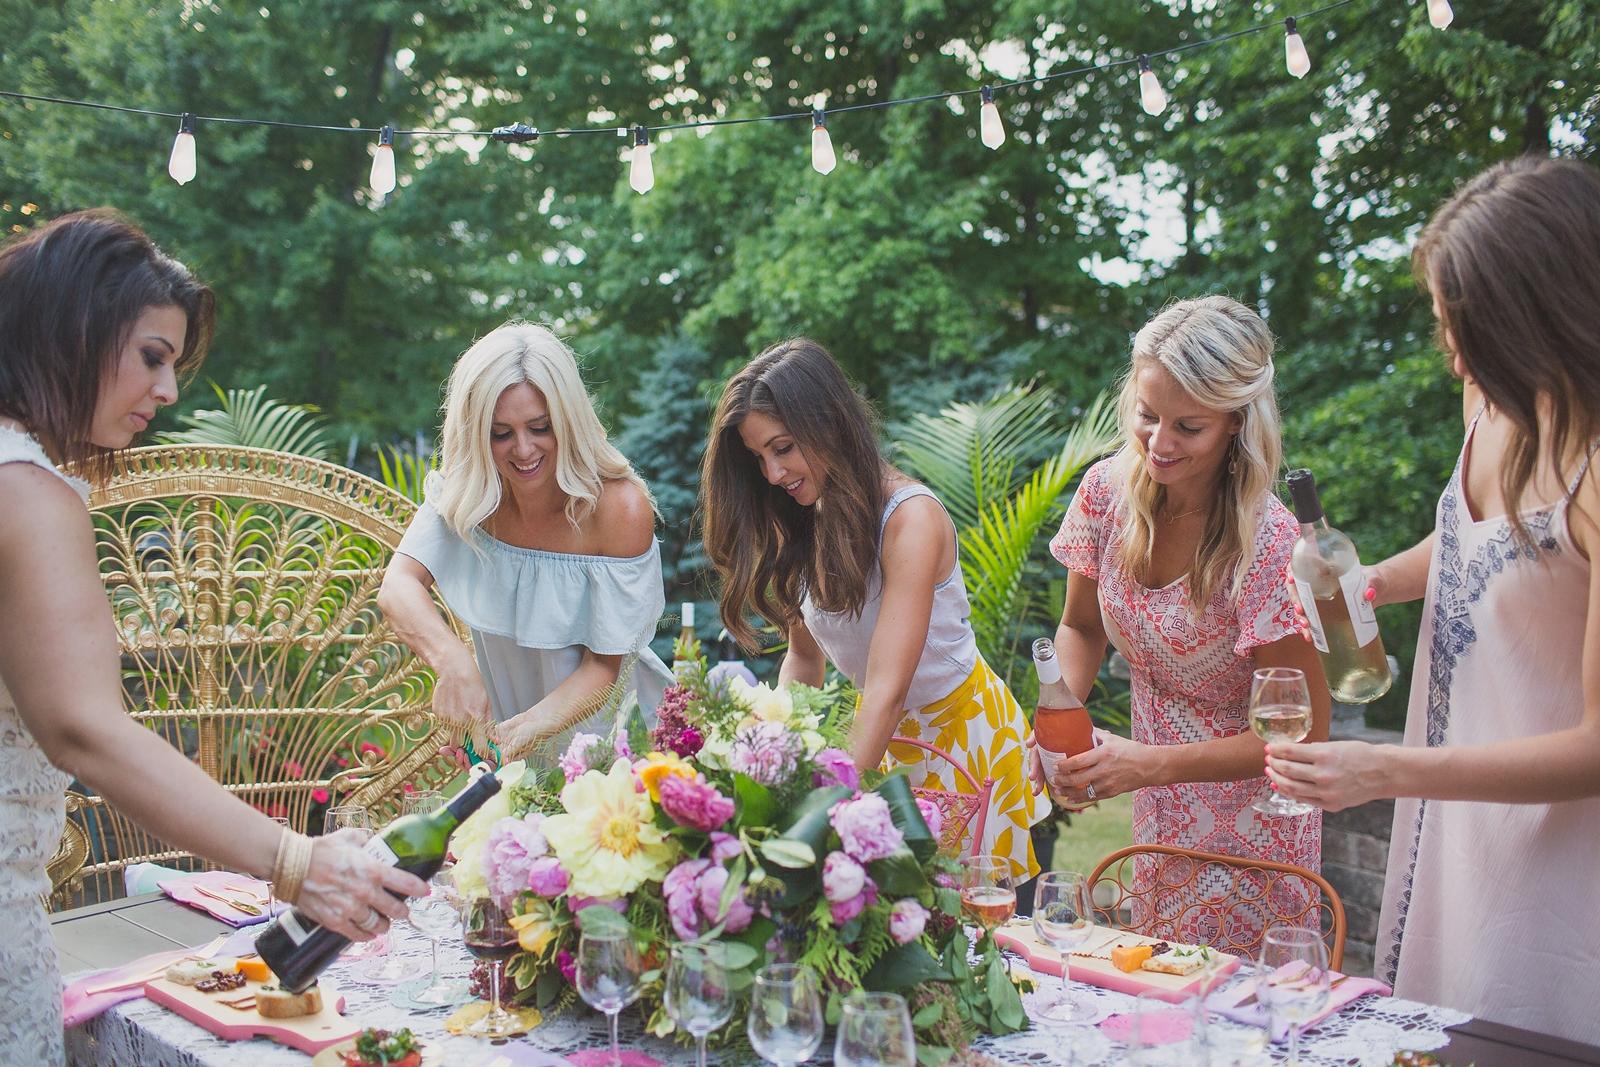 wine-tasting-one-stylish-party-44